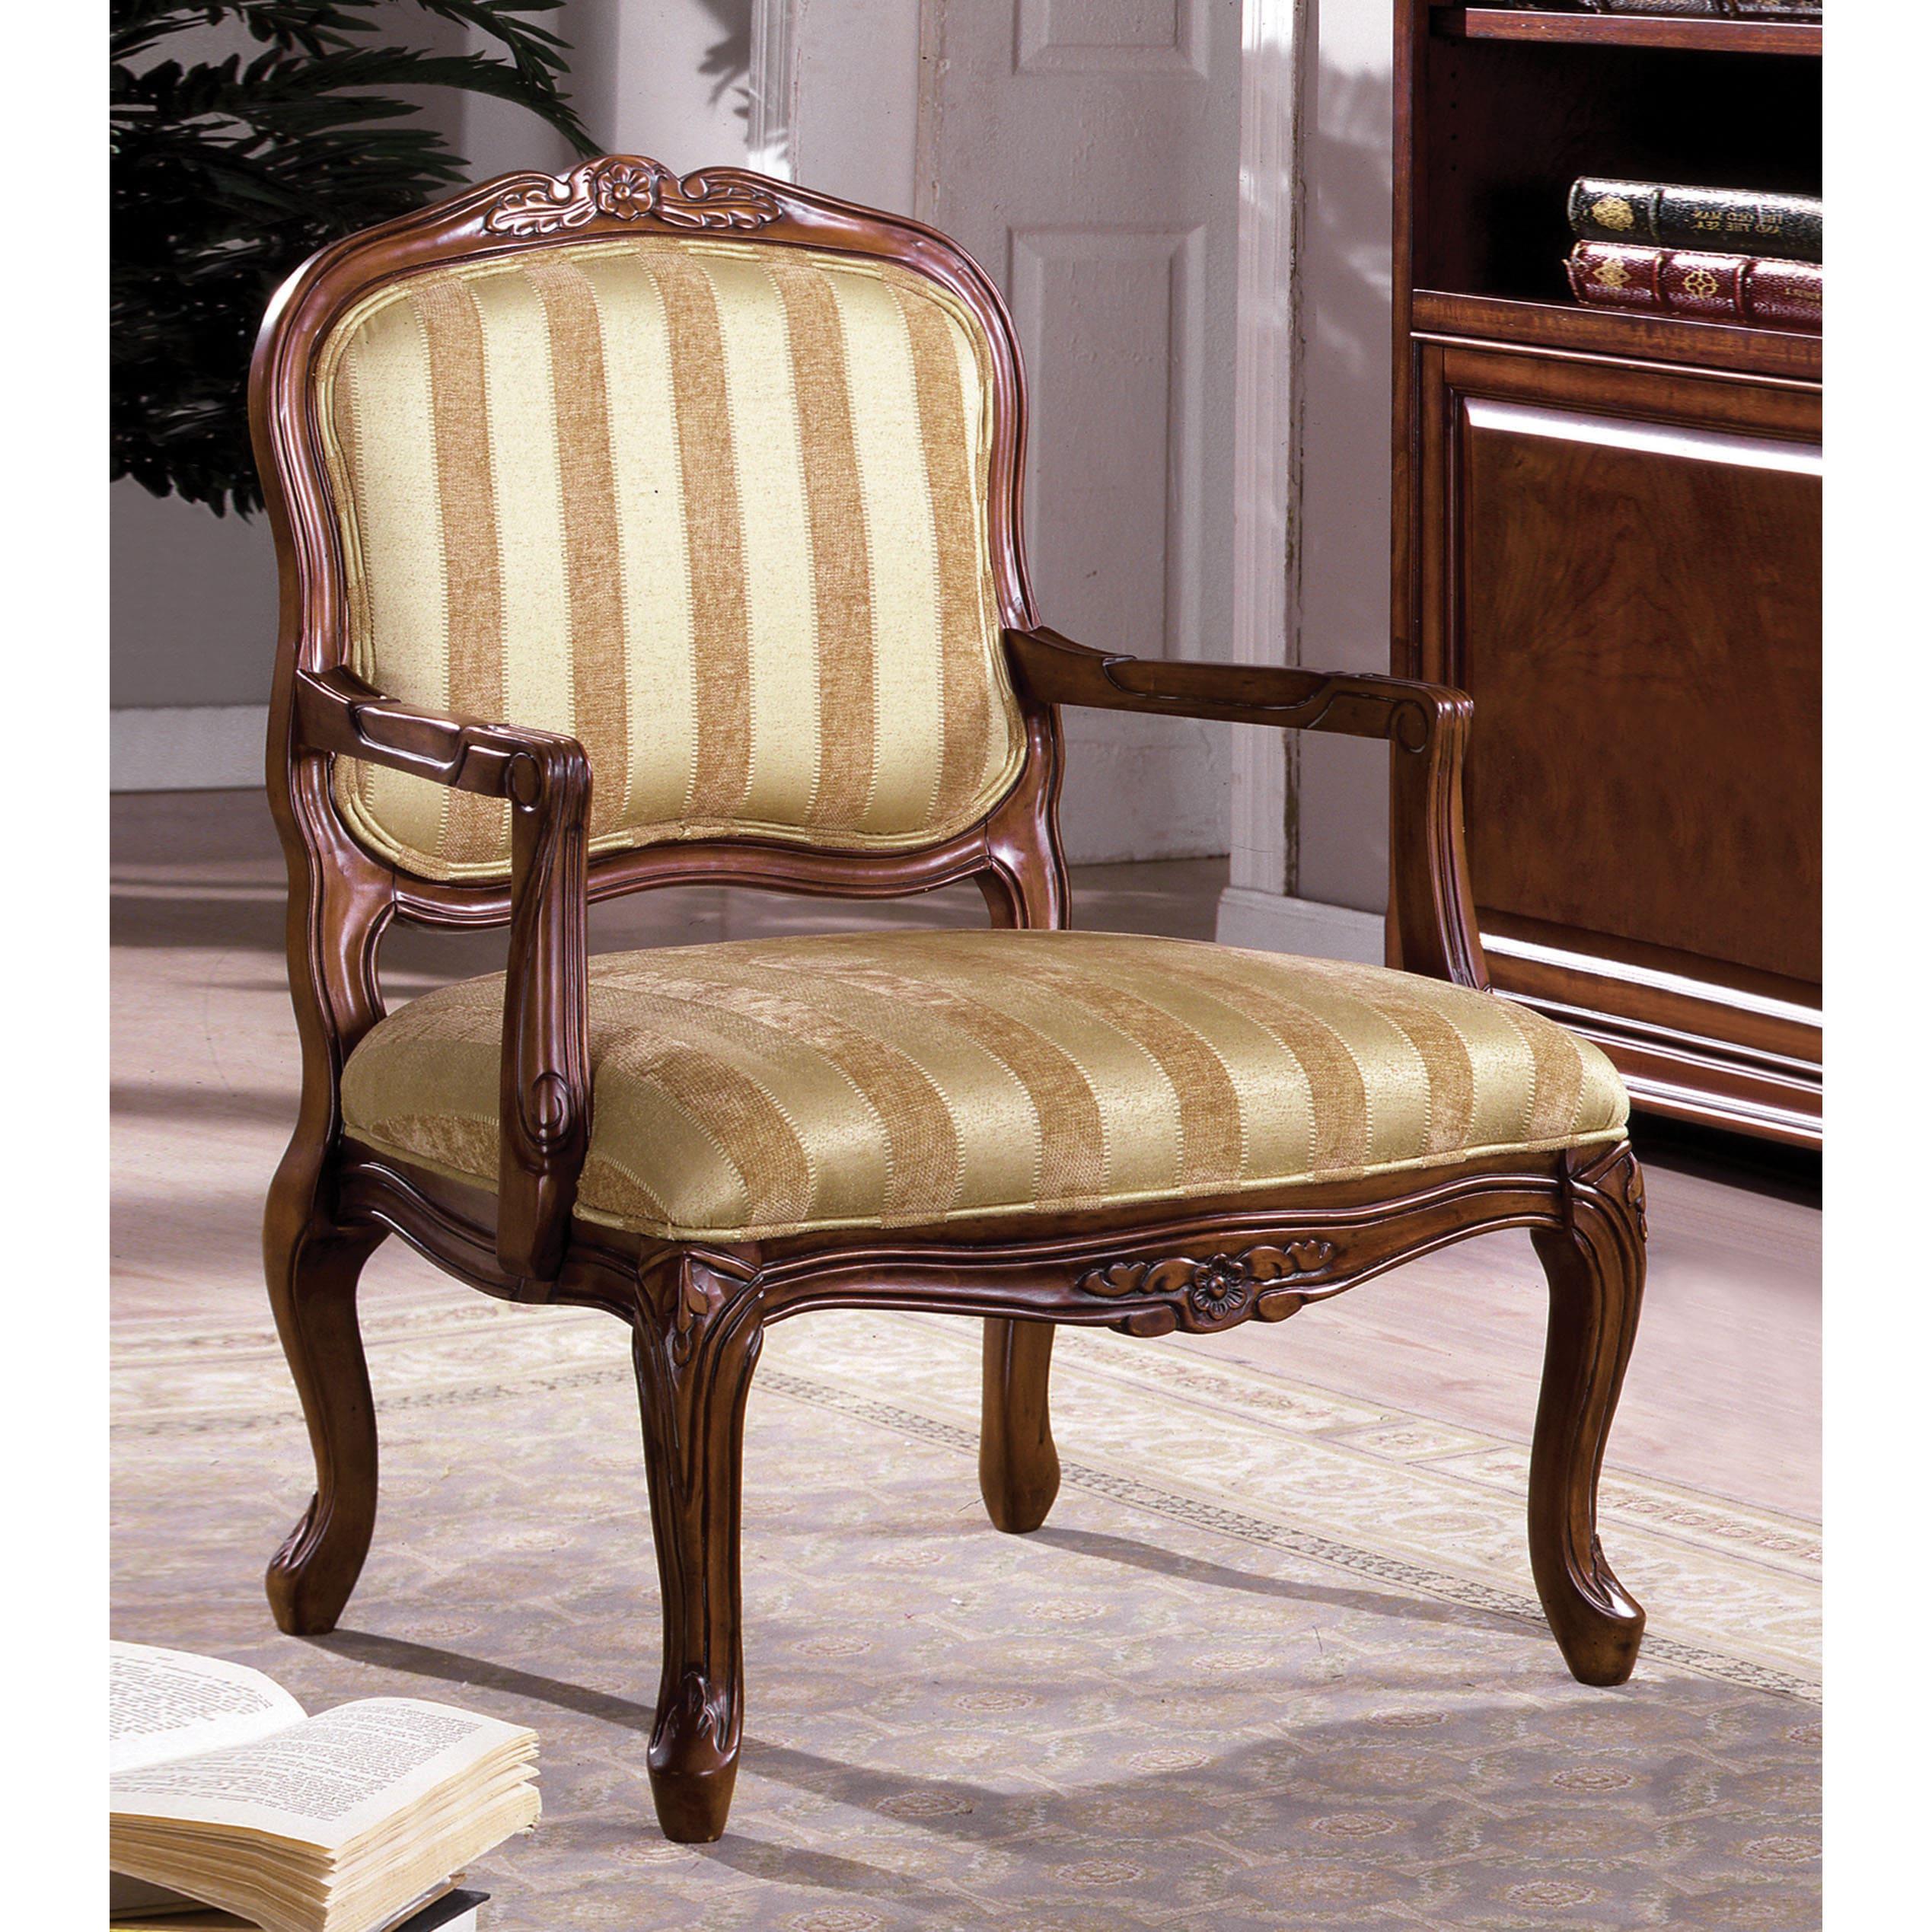 Copper Grove Catlerock Antique Oak Accent Chair